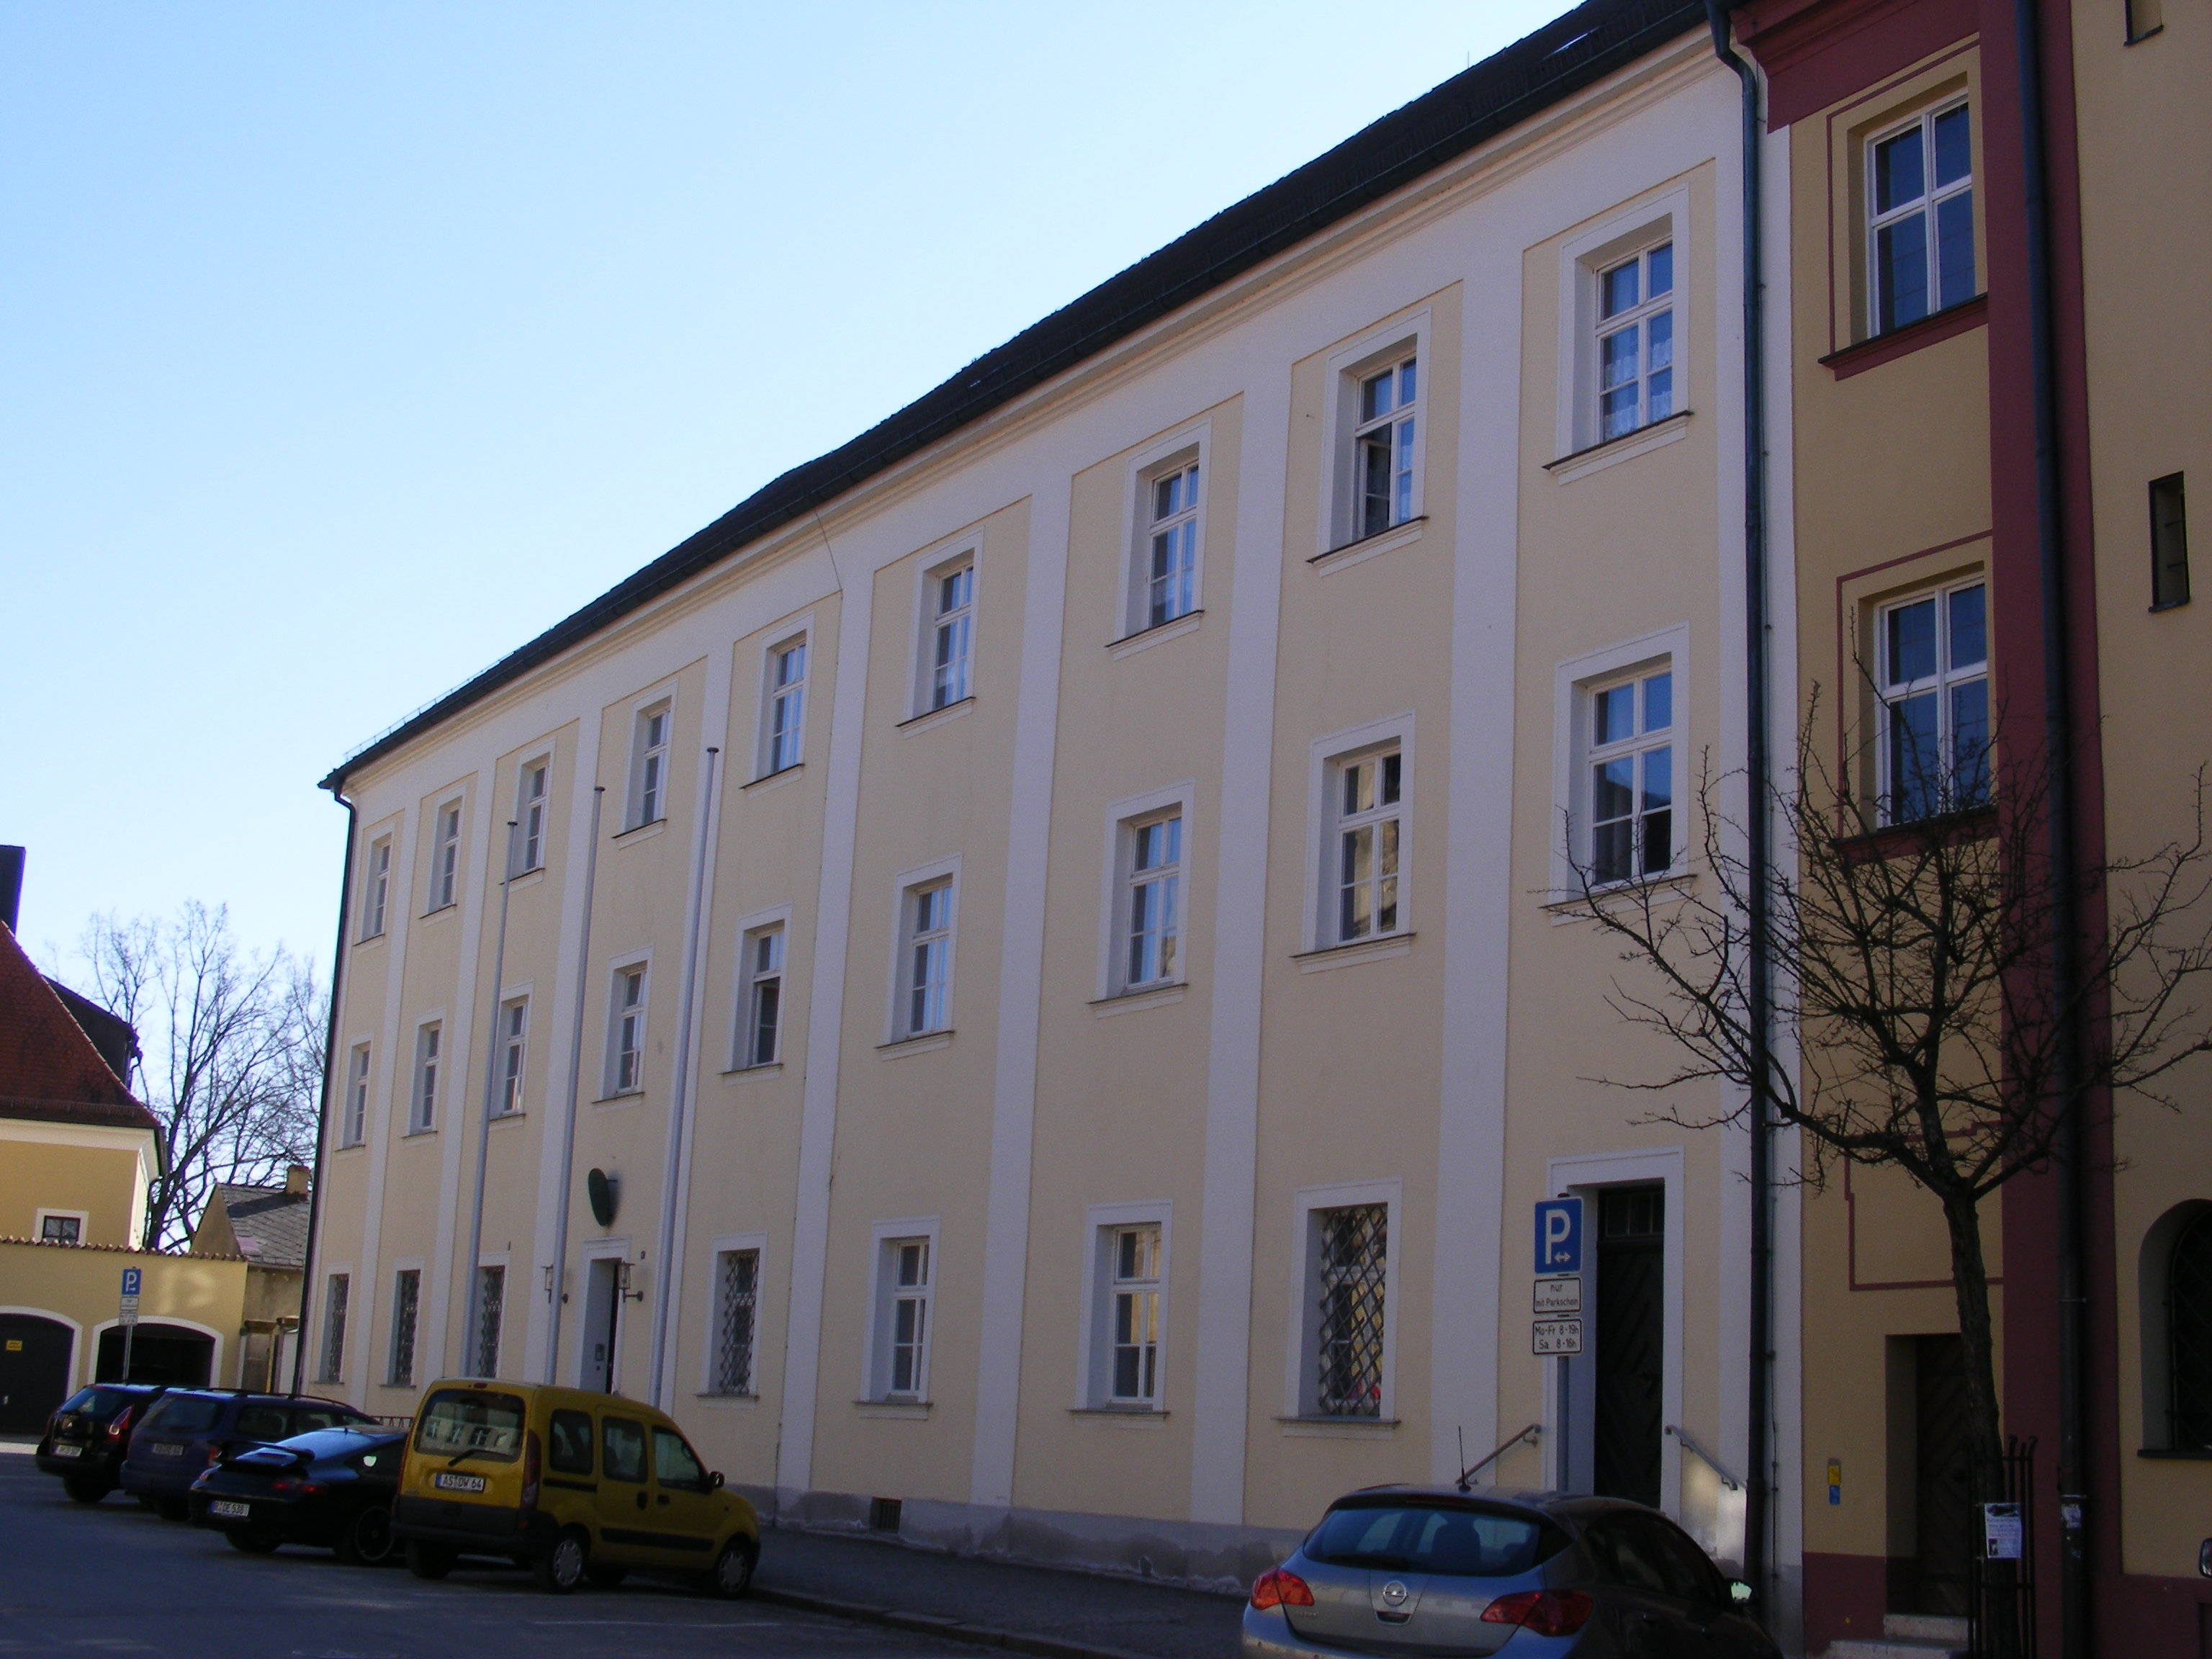 Amtsgericht Amberg